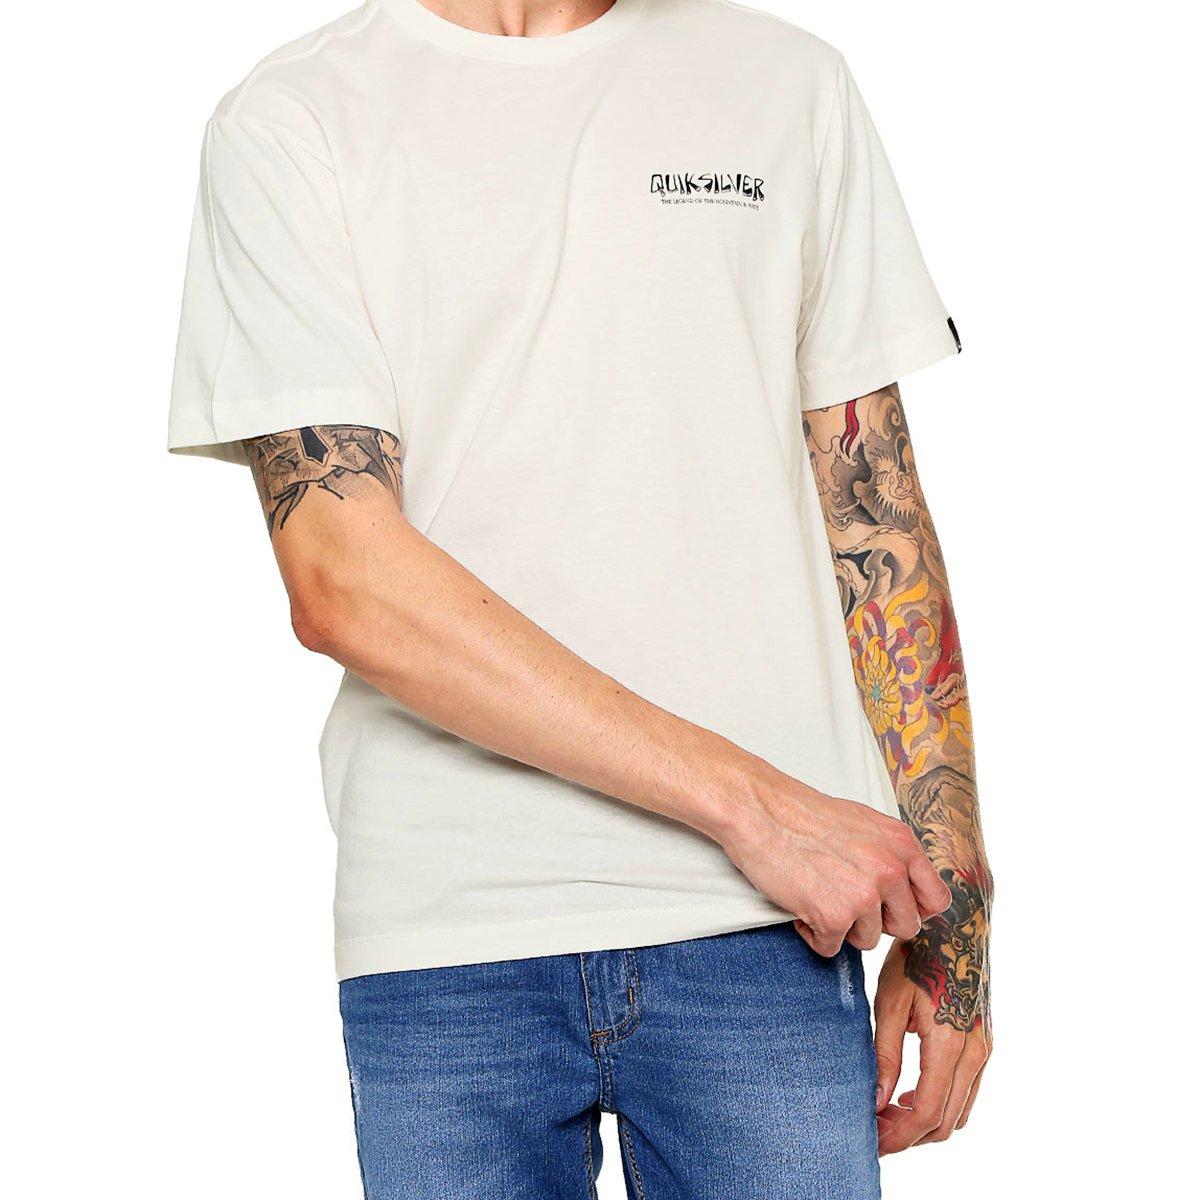 Camiseta Quiksilver Logo Off White Masculina - Branca